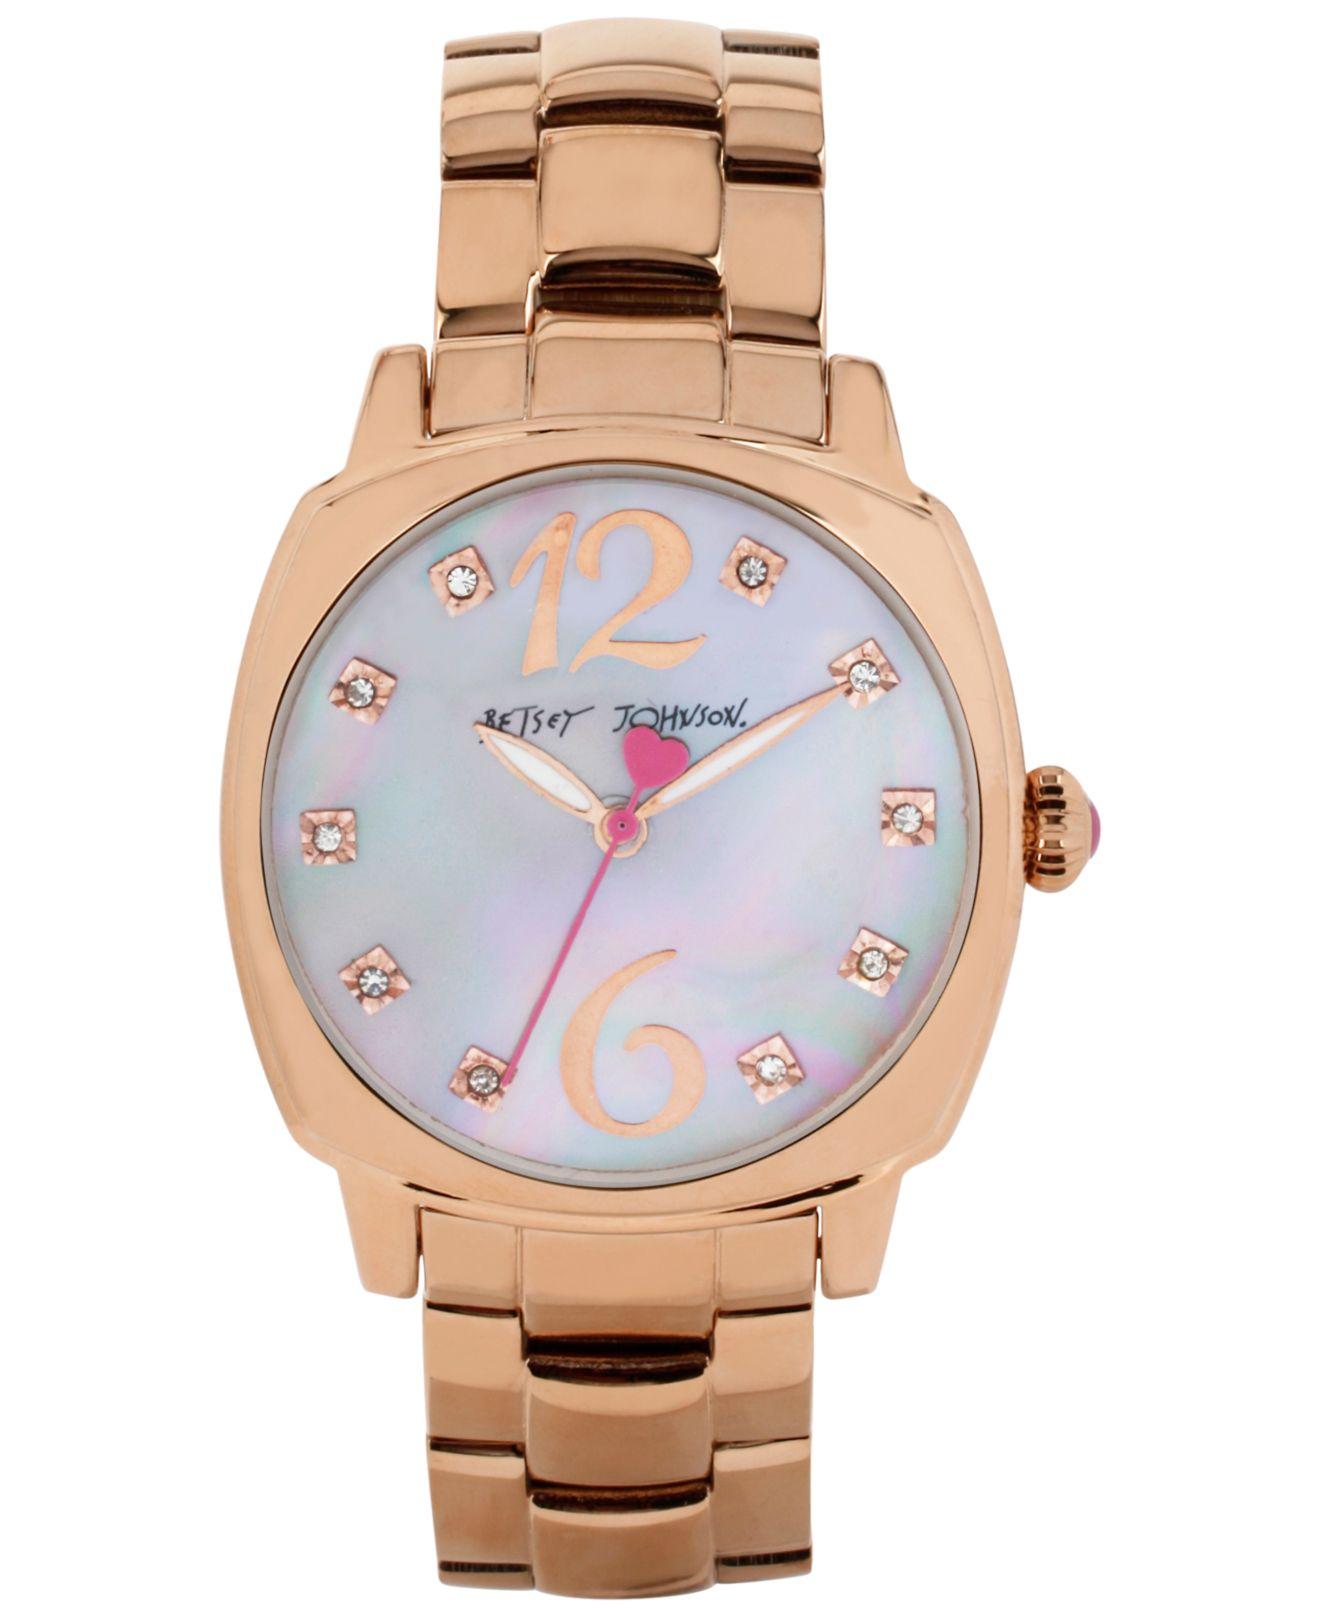 Lyst Betsey Johnson Womens Rose Gold Tone Bracelet Watch 41mm Fossil Idealist Silver Es4194 Gallery